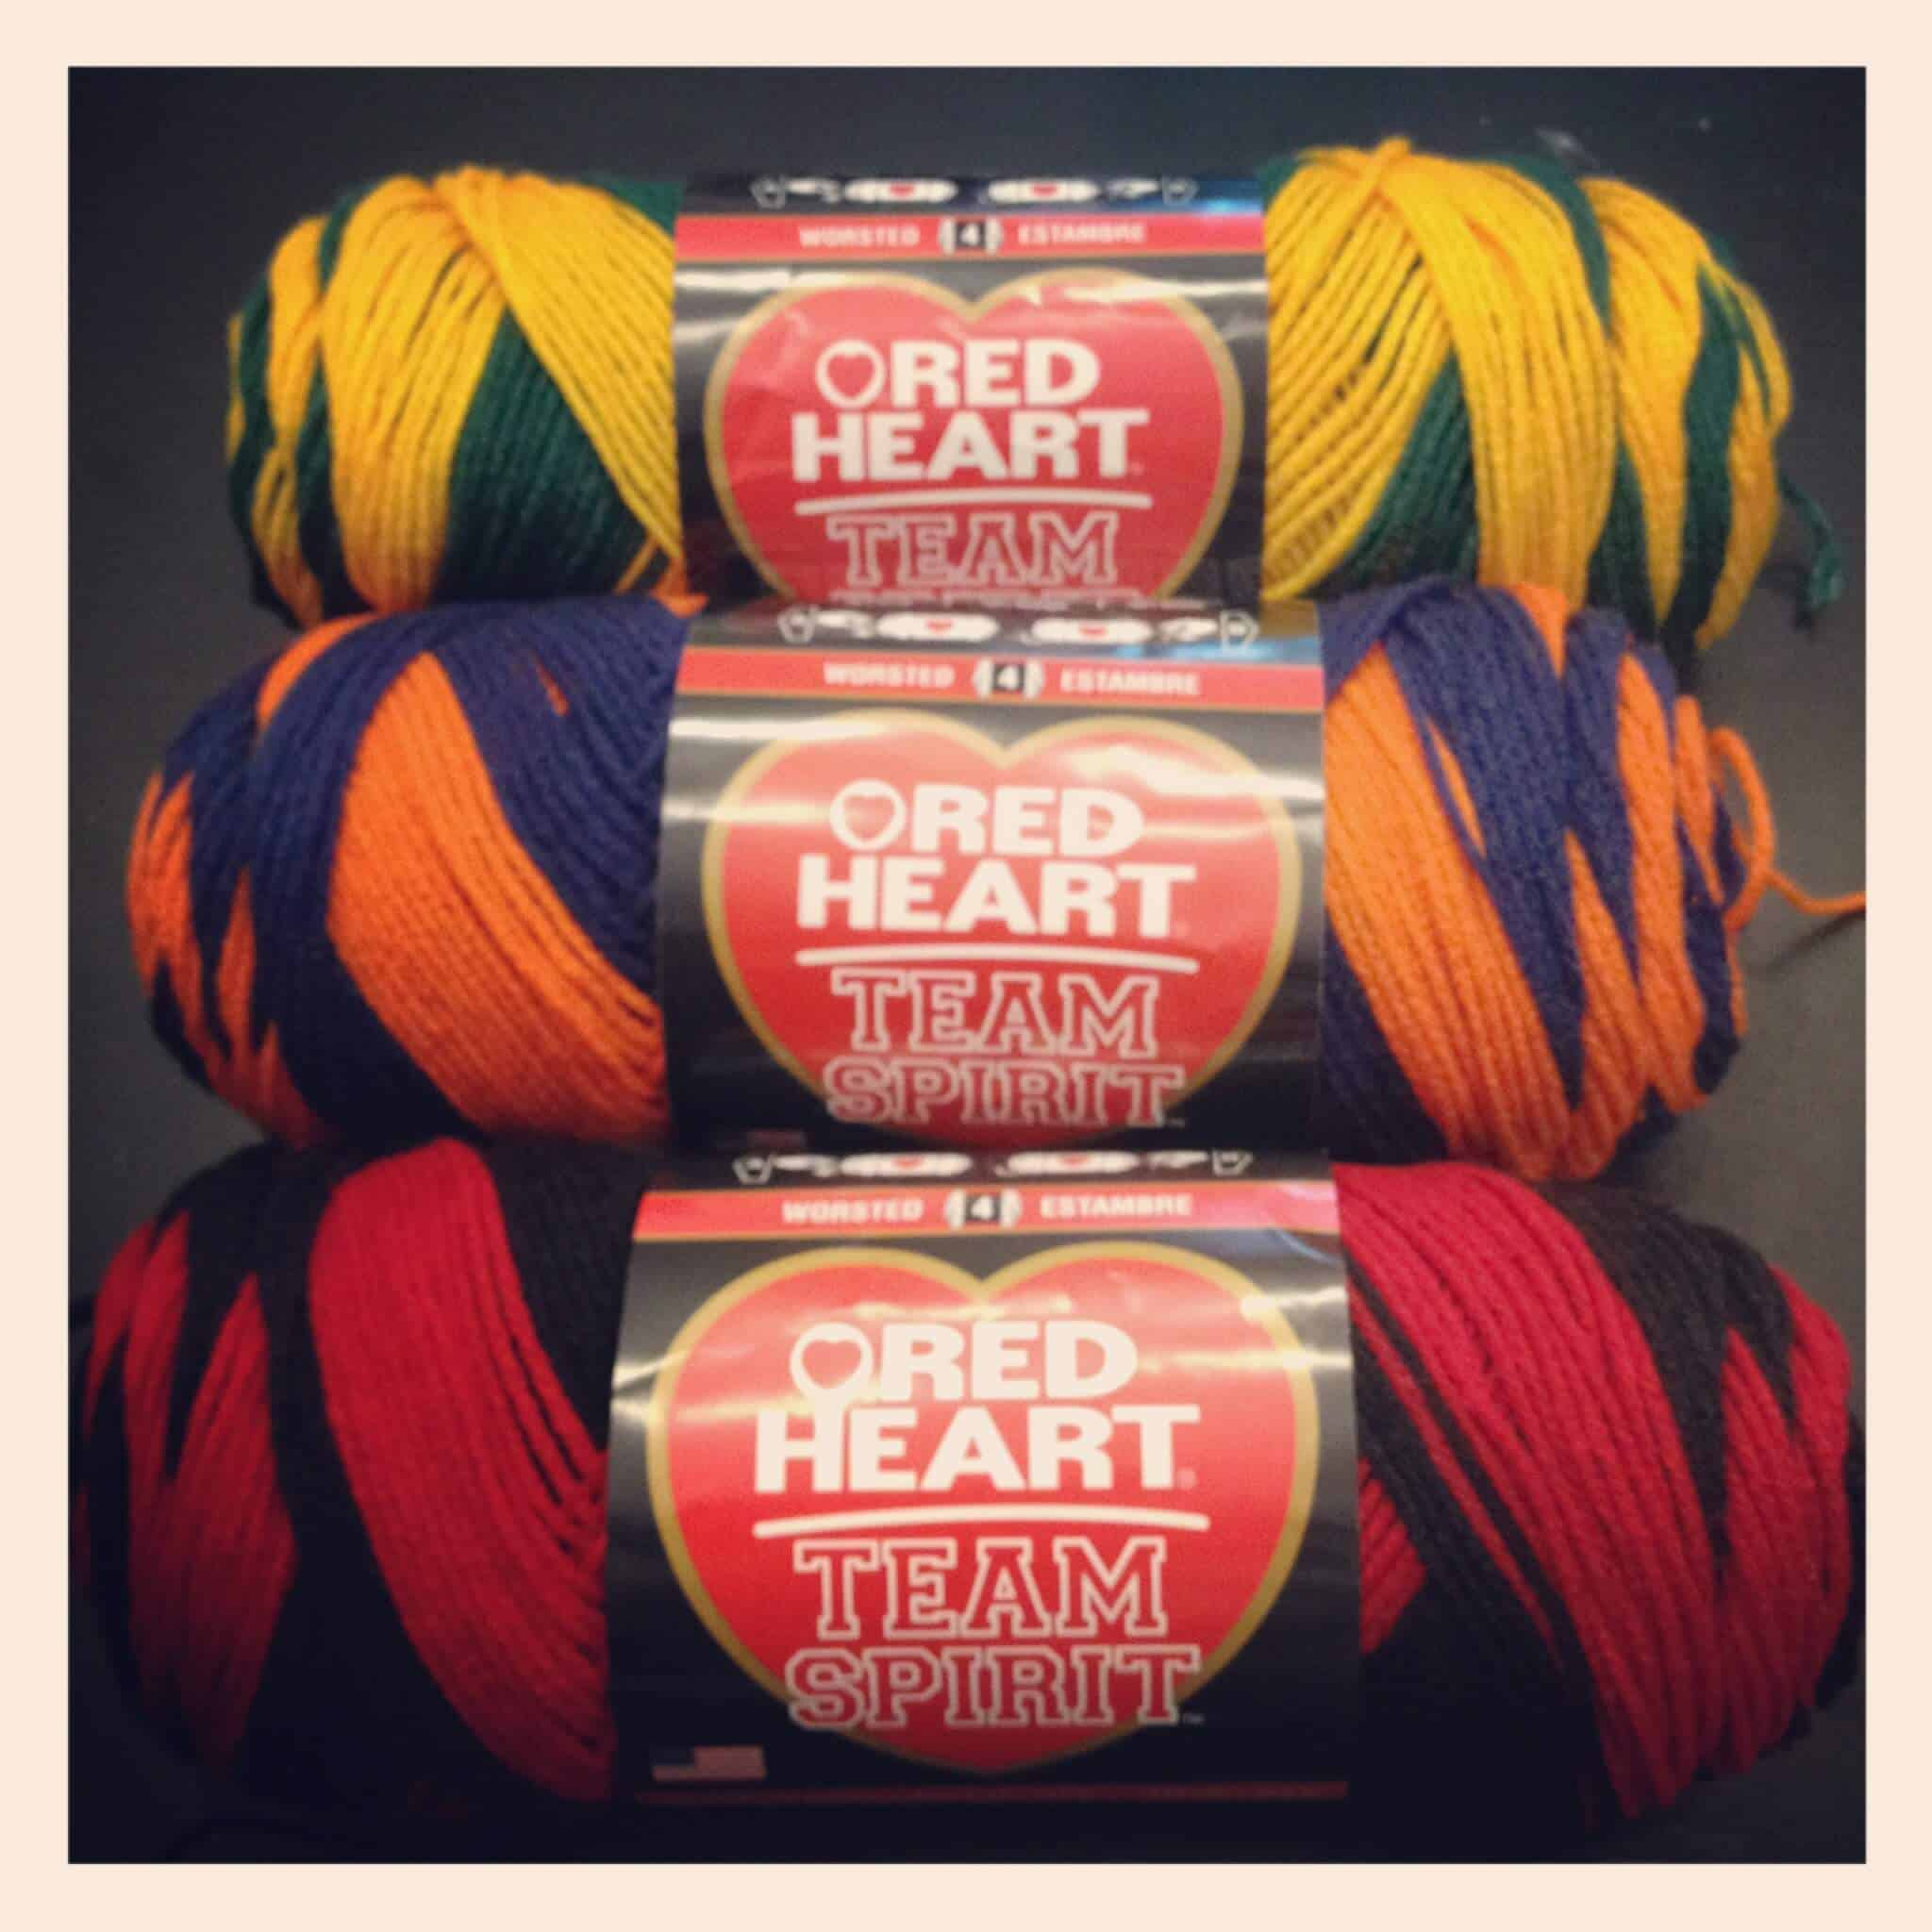 Red Heart Yarn